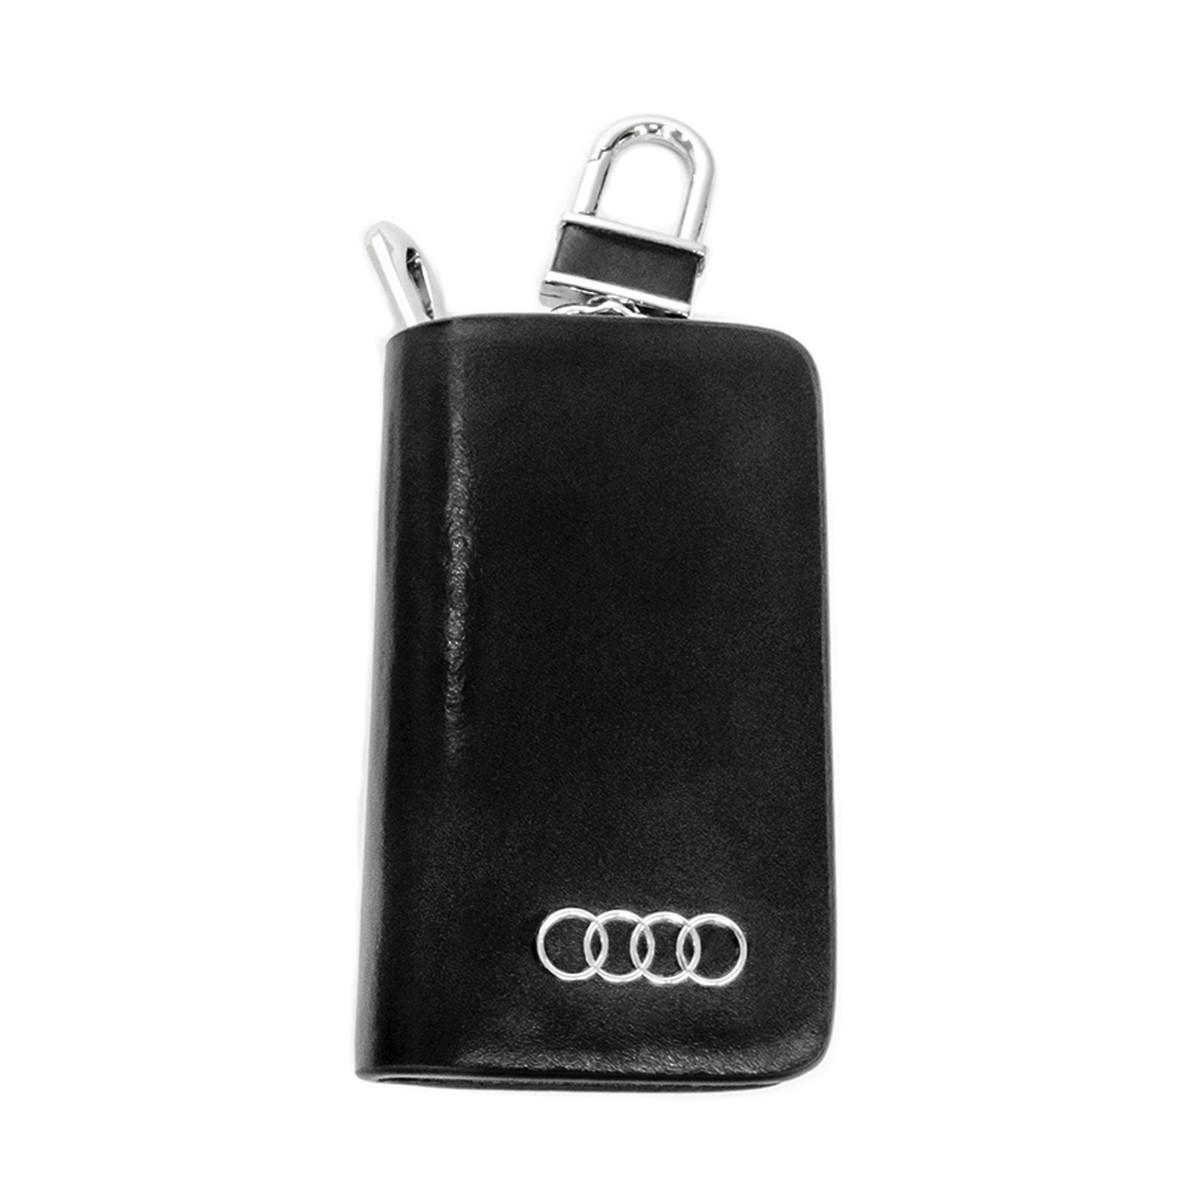 Ключница Carss с логотипом AUDI 01002 черная